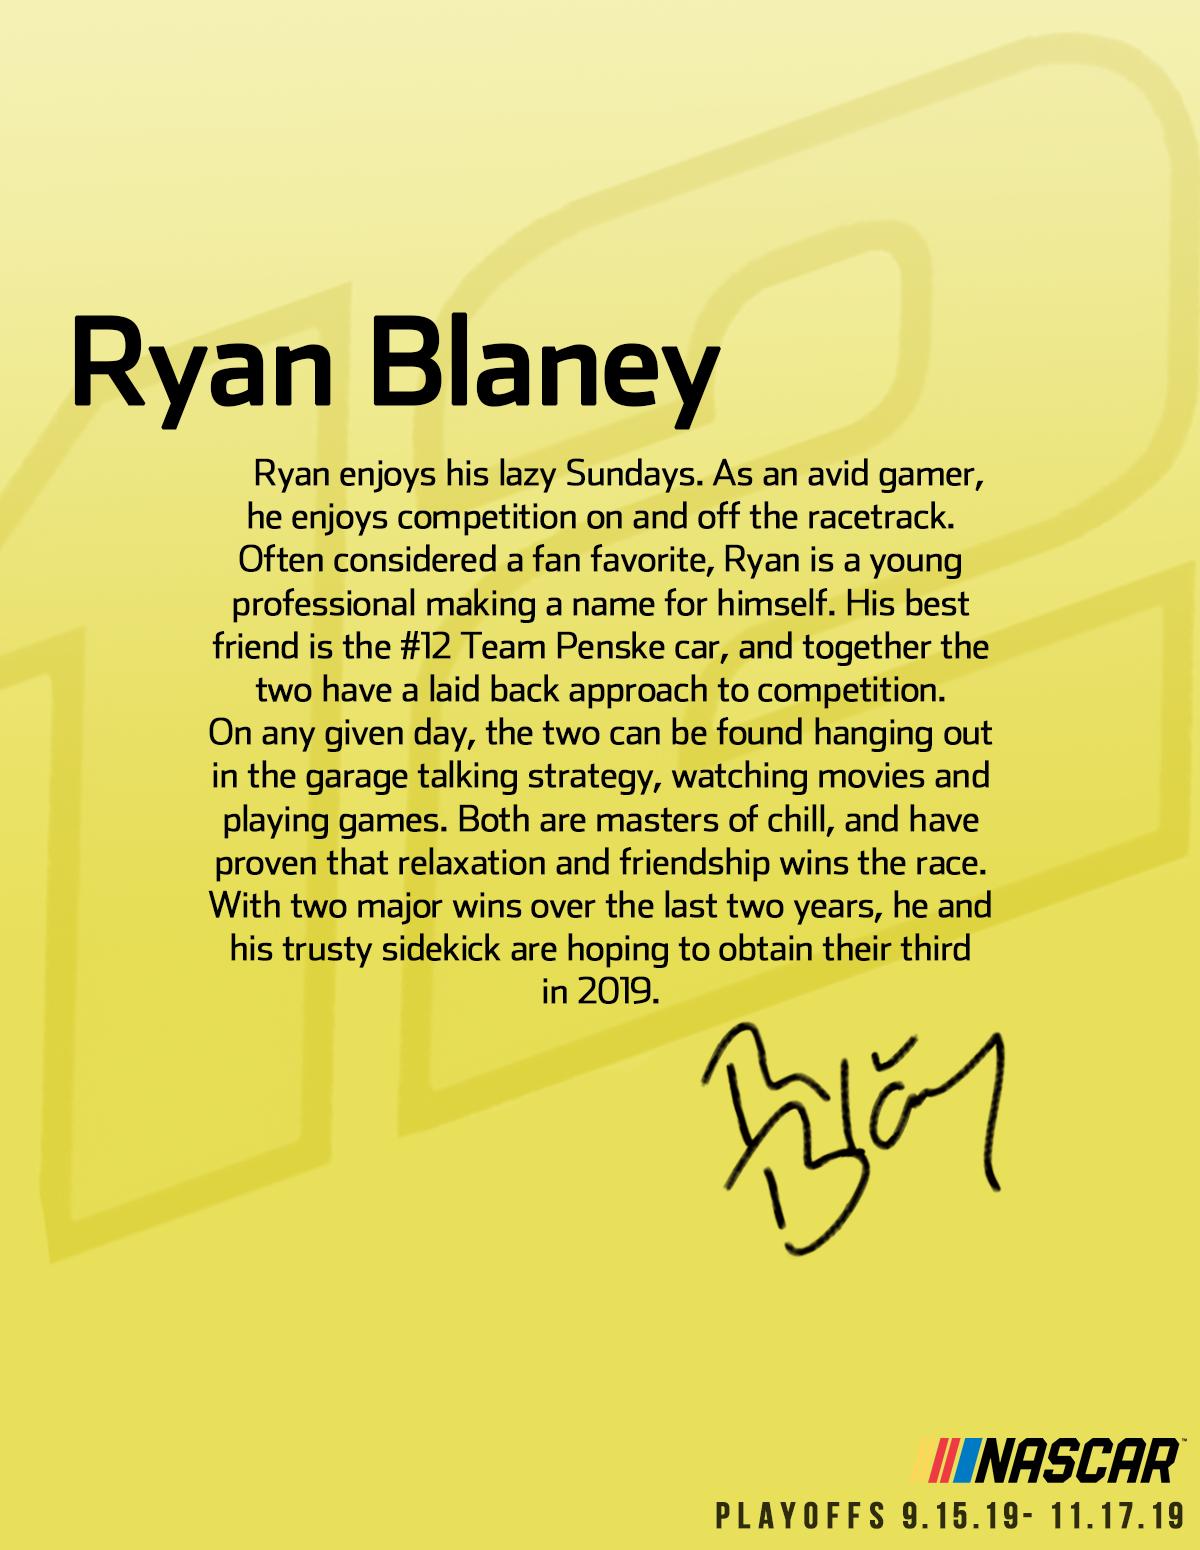 RyanBlaneyFinal.png